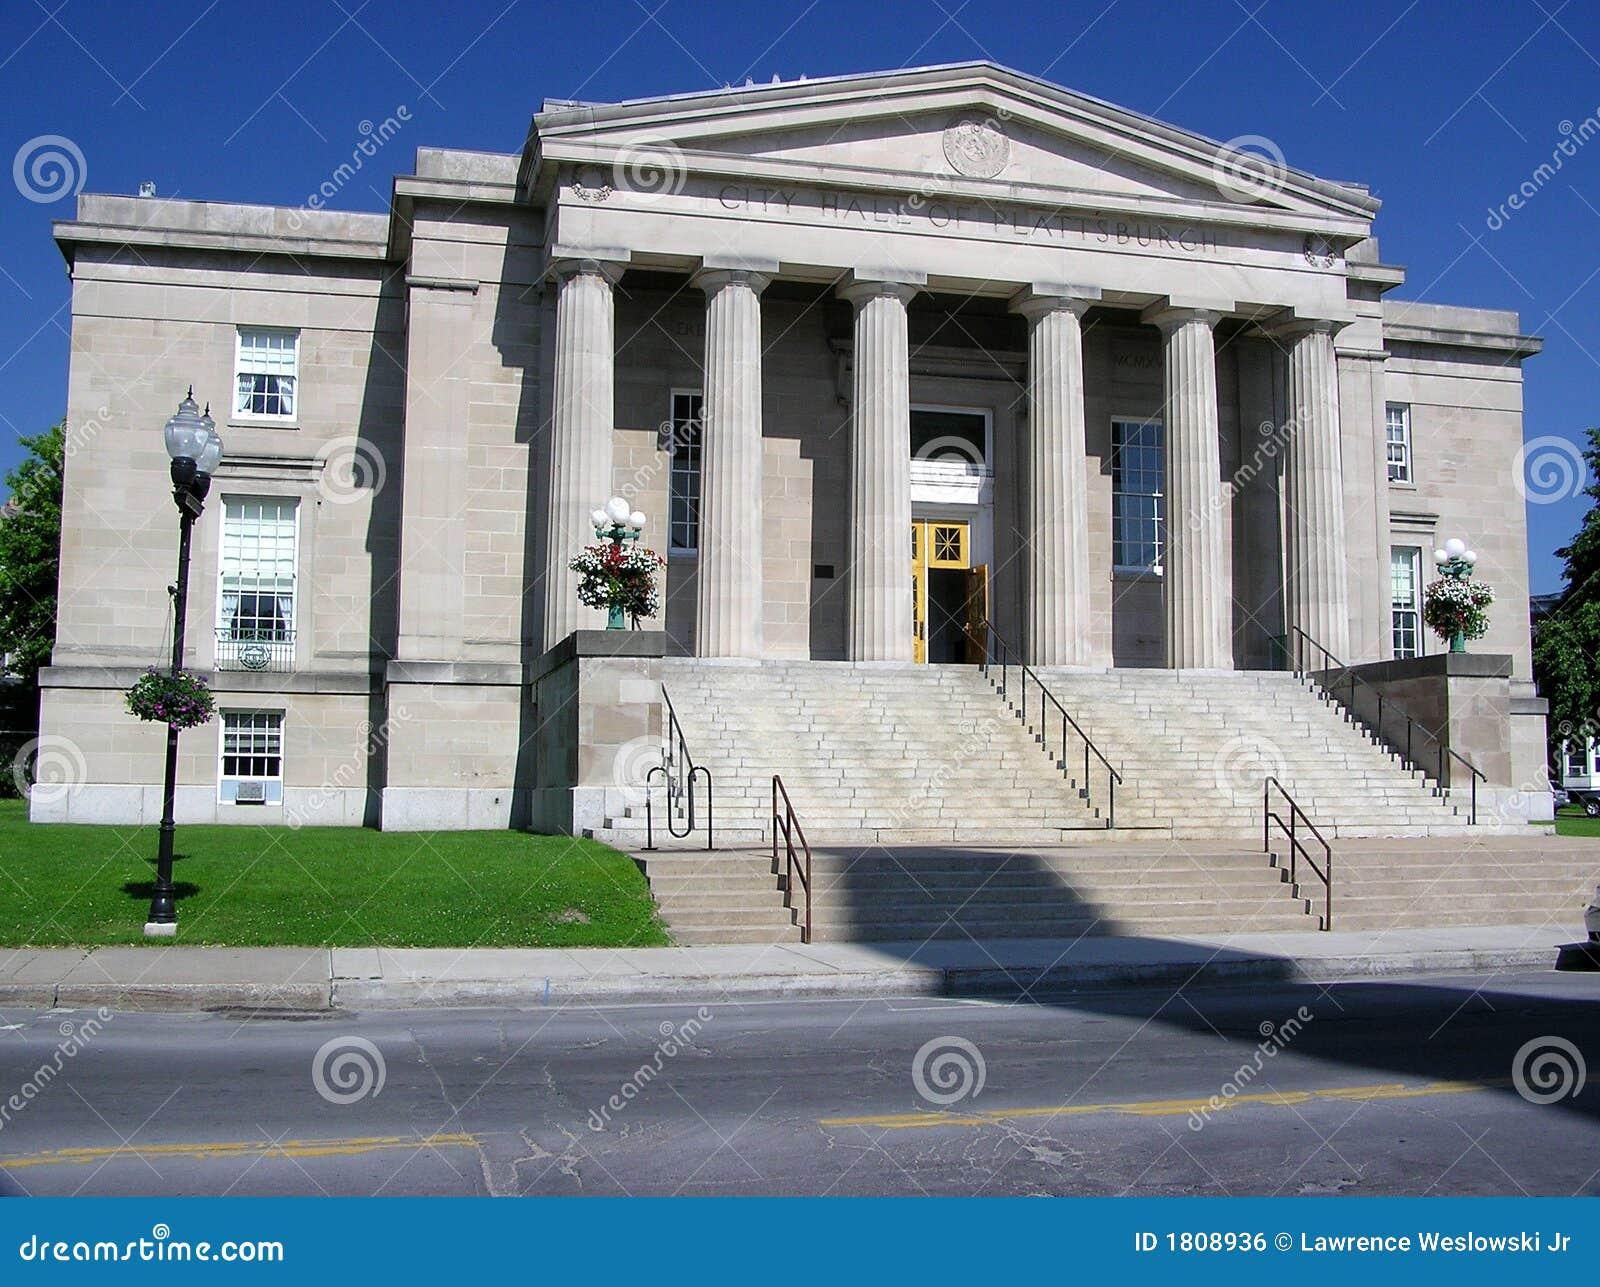 City Hall In Plattsburgh, New York Royalty Free Stock Image - Image: 1808936